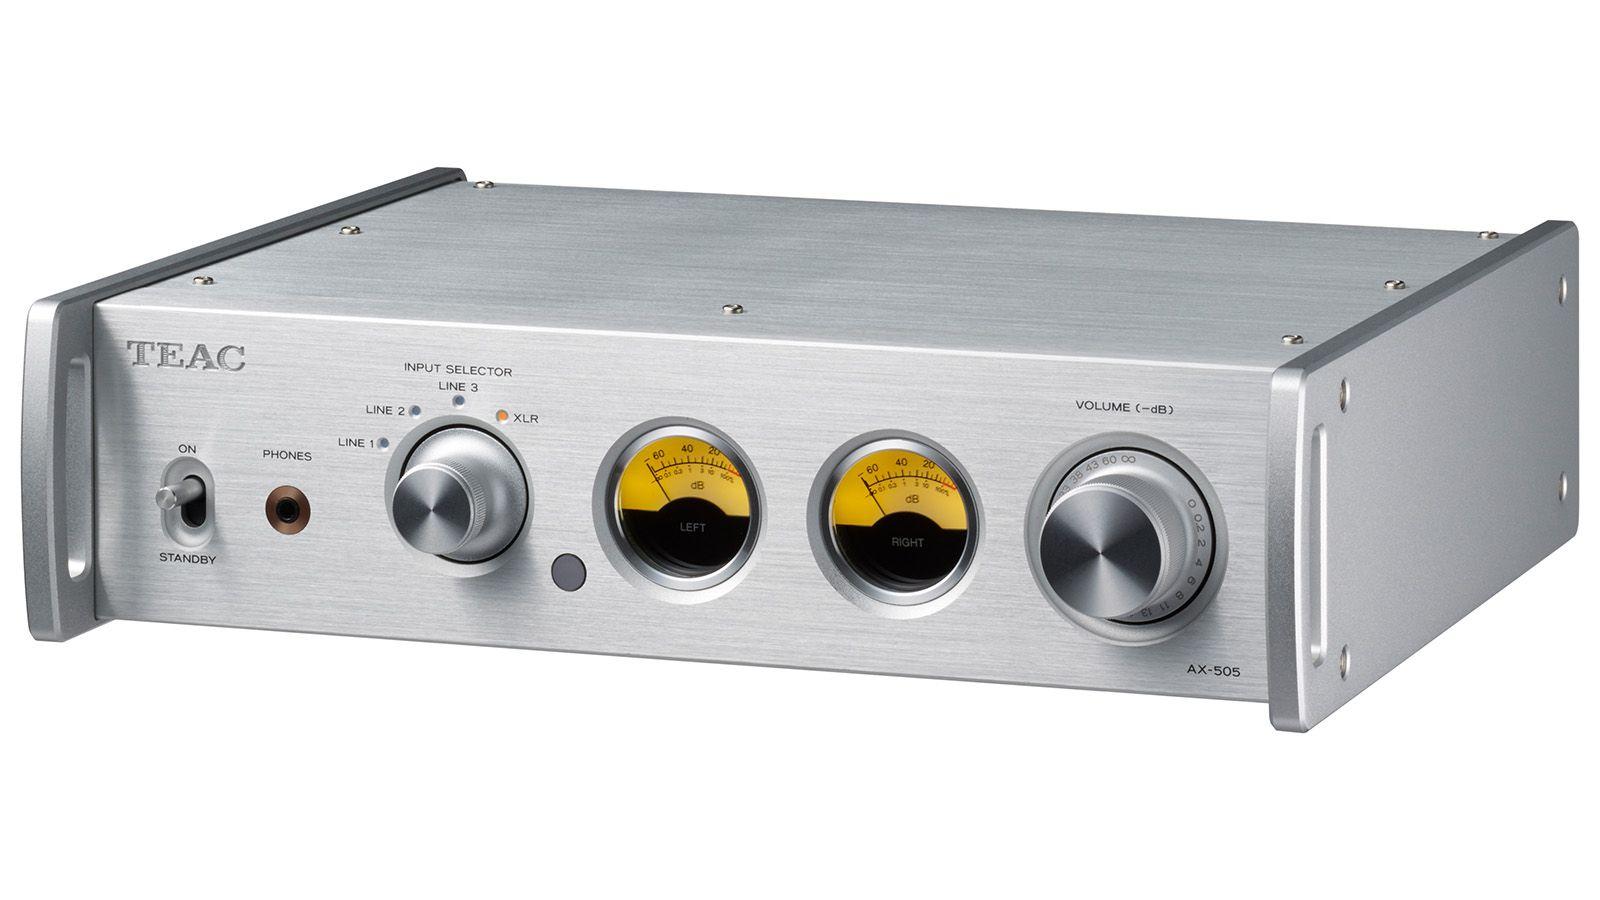 TEAC AX 505 - TEAC(ティアック) AX-505はコスパの良いプリメインアンプ【10万円台】